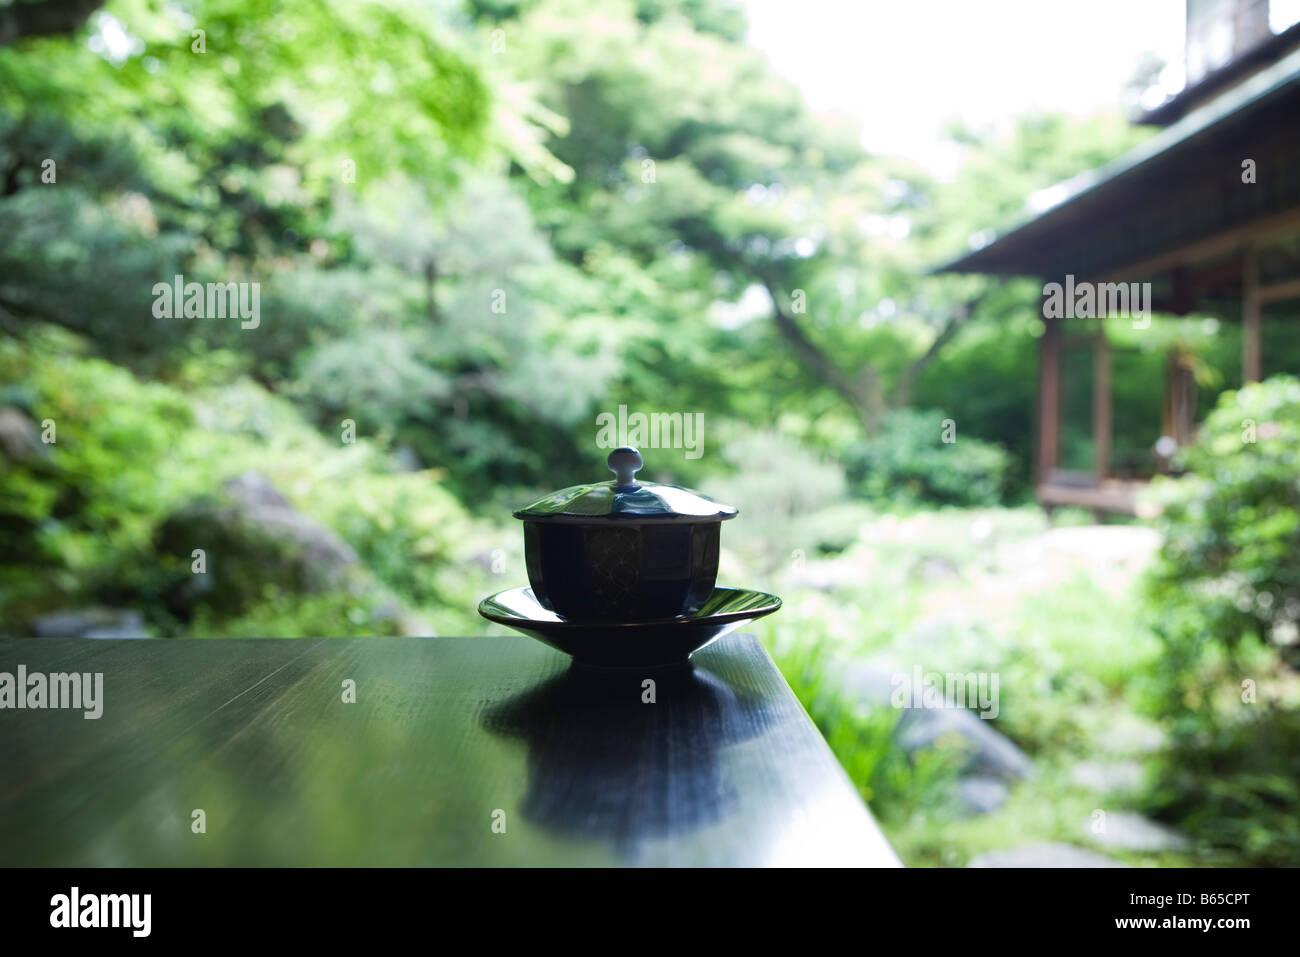 peacefulness stockfotos peacefulness bilder alamy. Black Bedroom Furniture Sets. Home Design Ideas